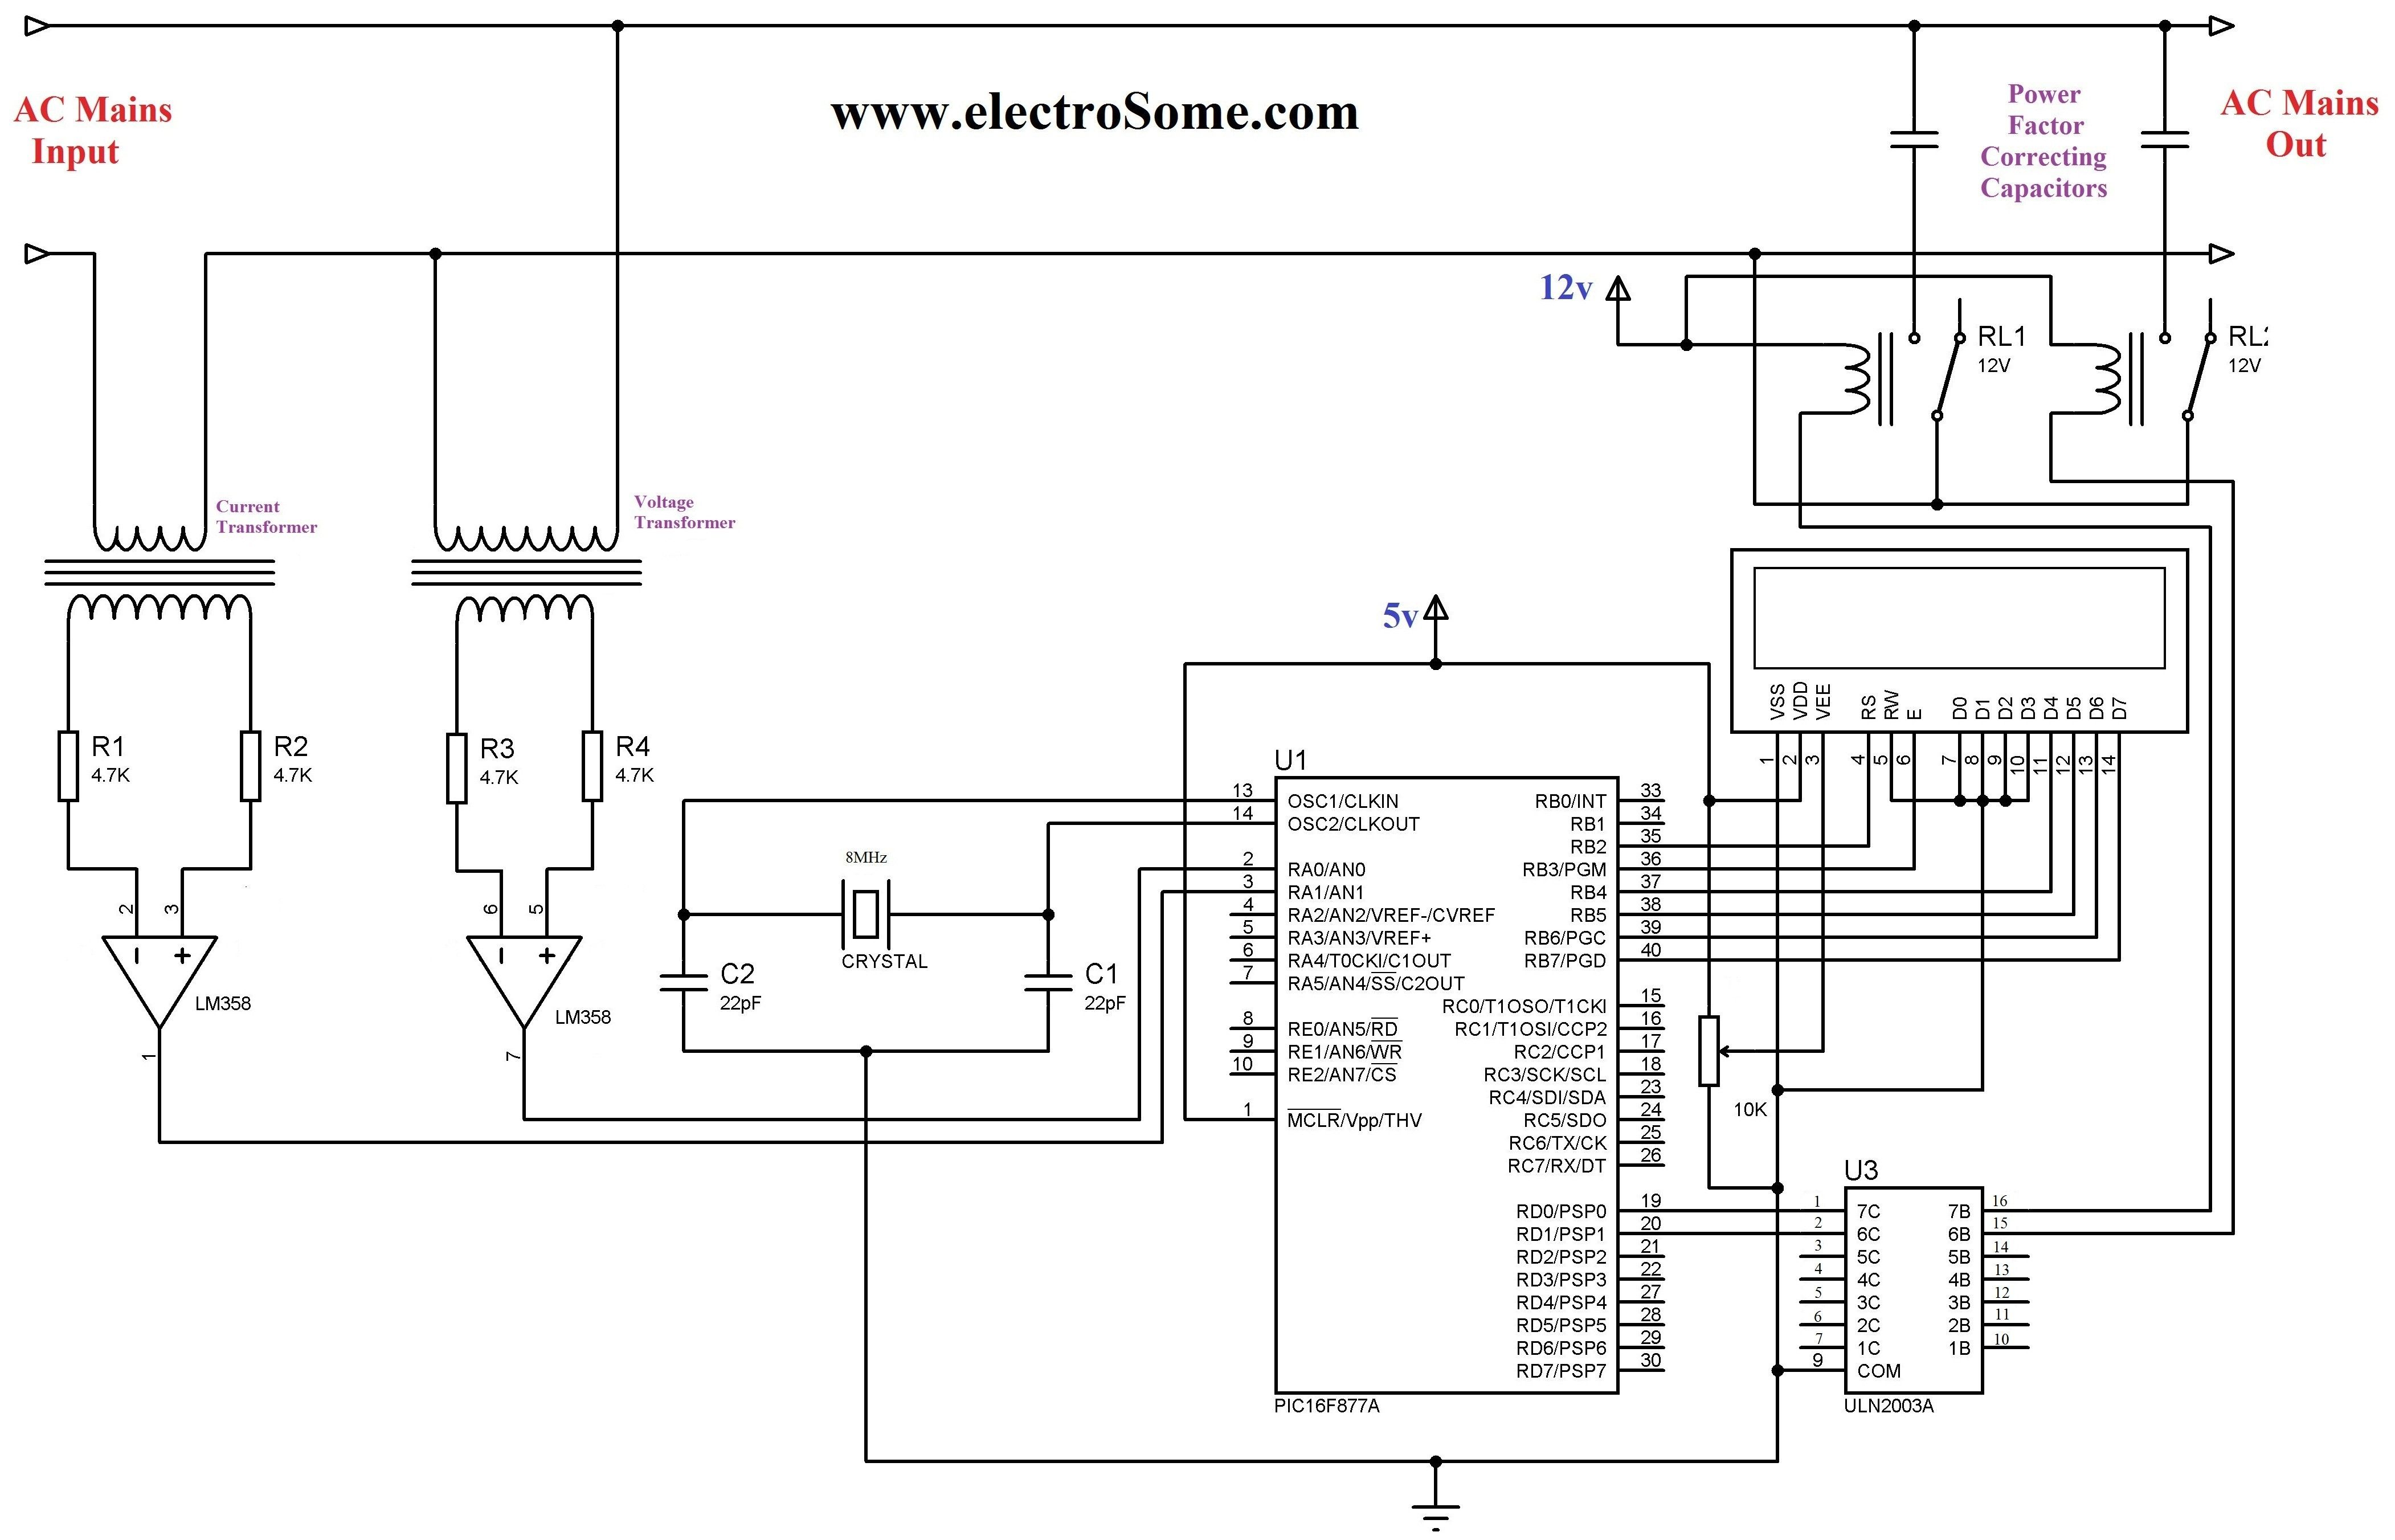 New Control Wiring Diagram Definition Diagram